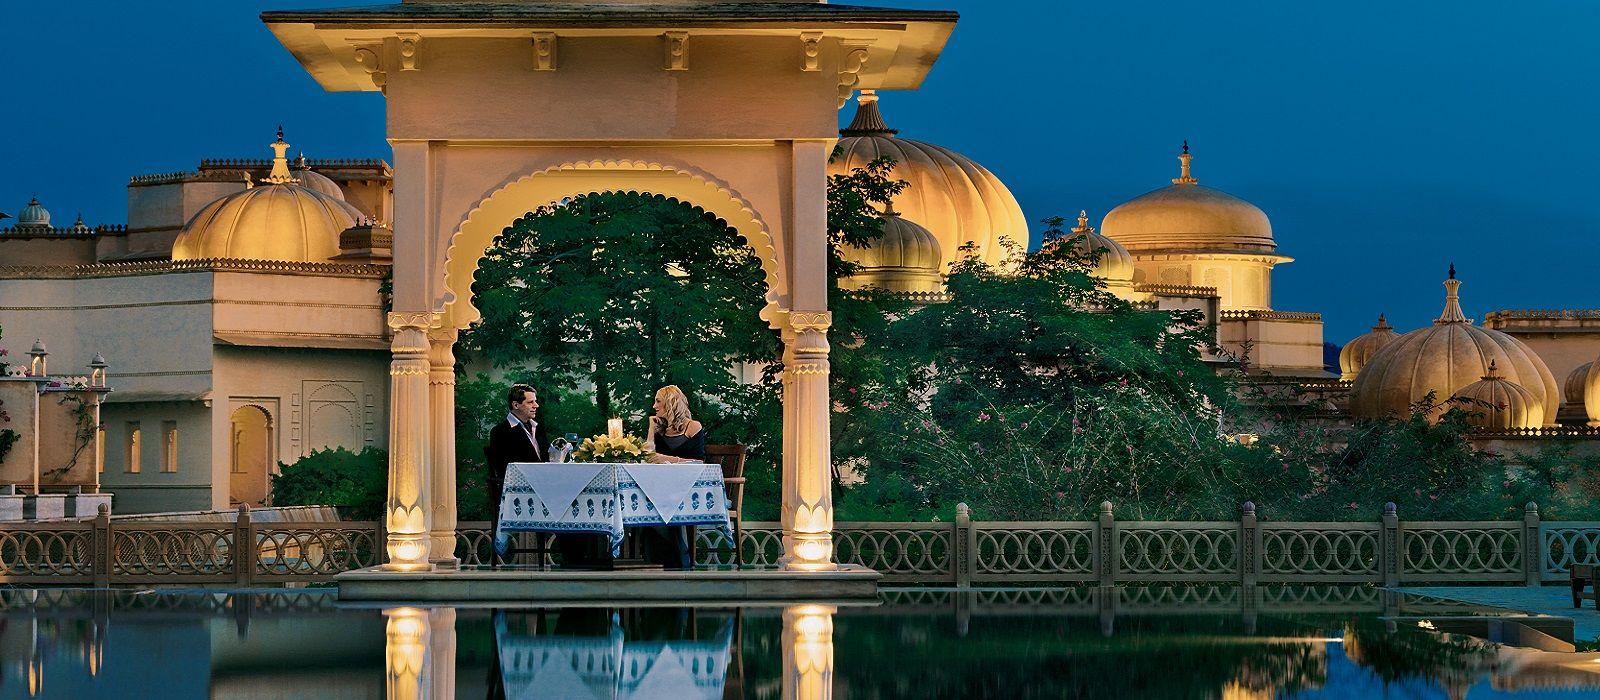 Luxurious Rajasthan and the Taj Mahal: Oberoi Special Tour Trip 1